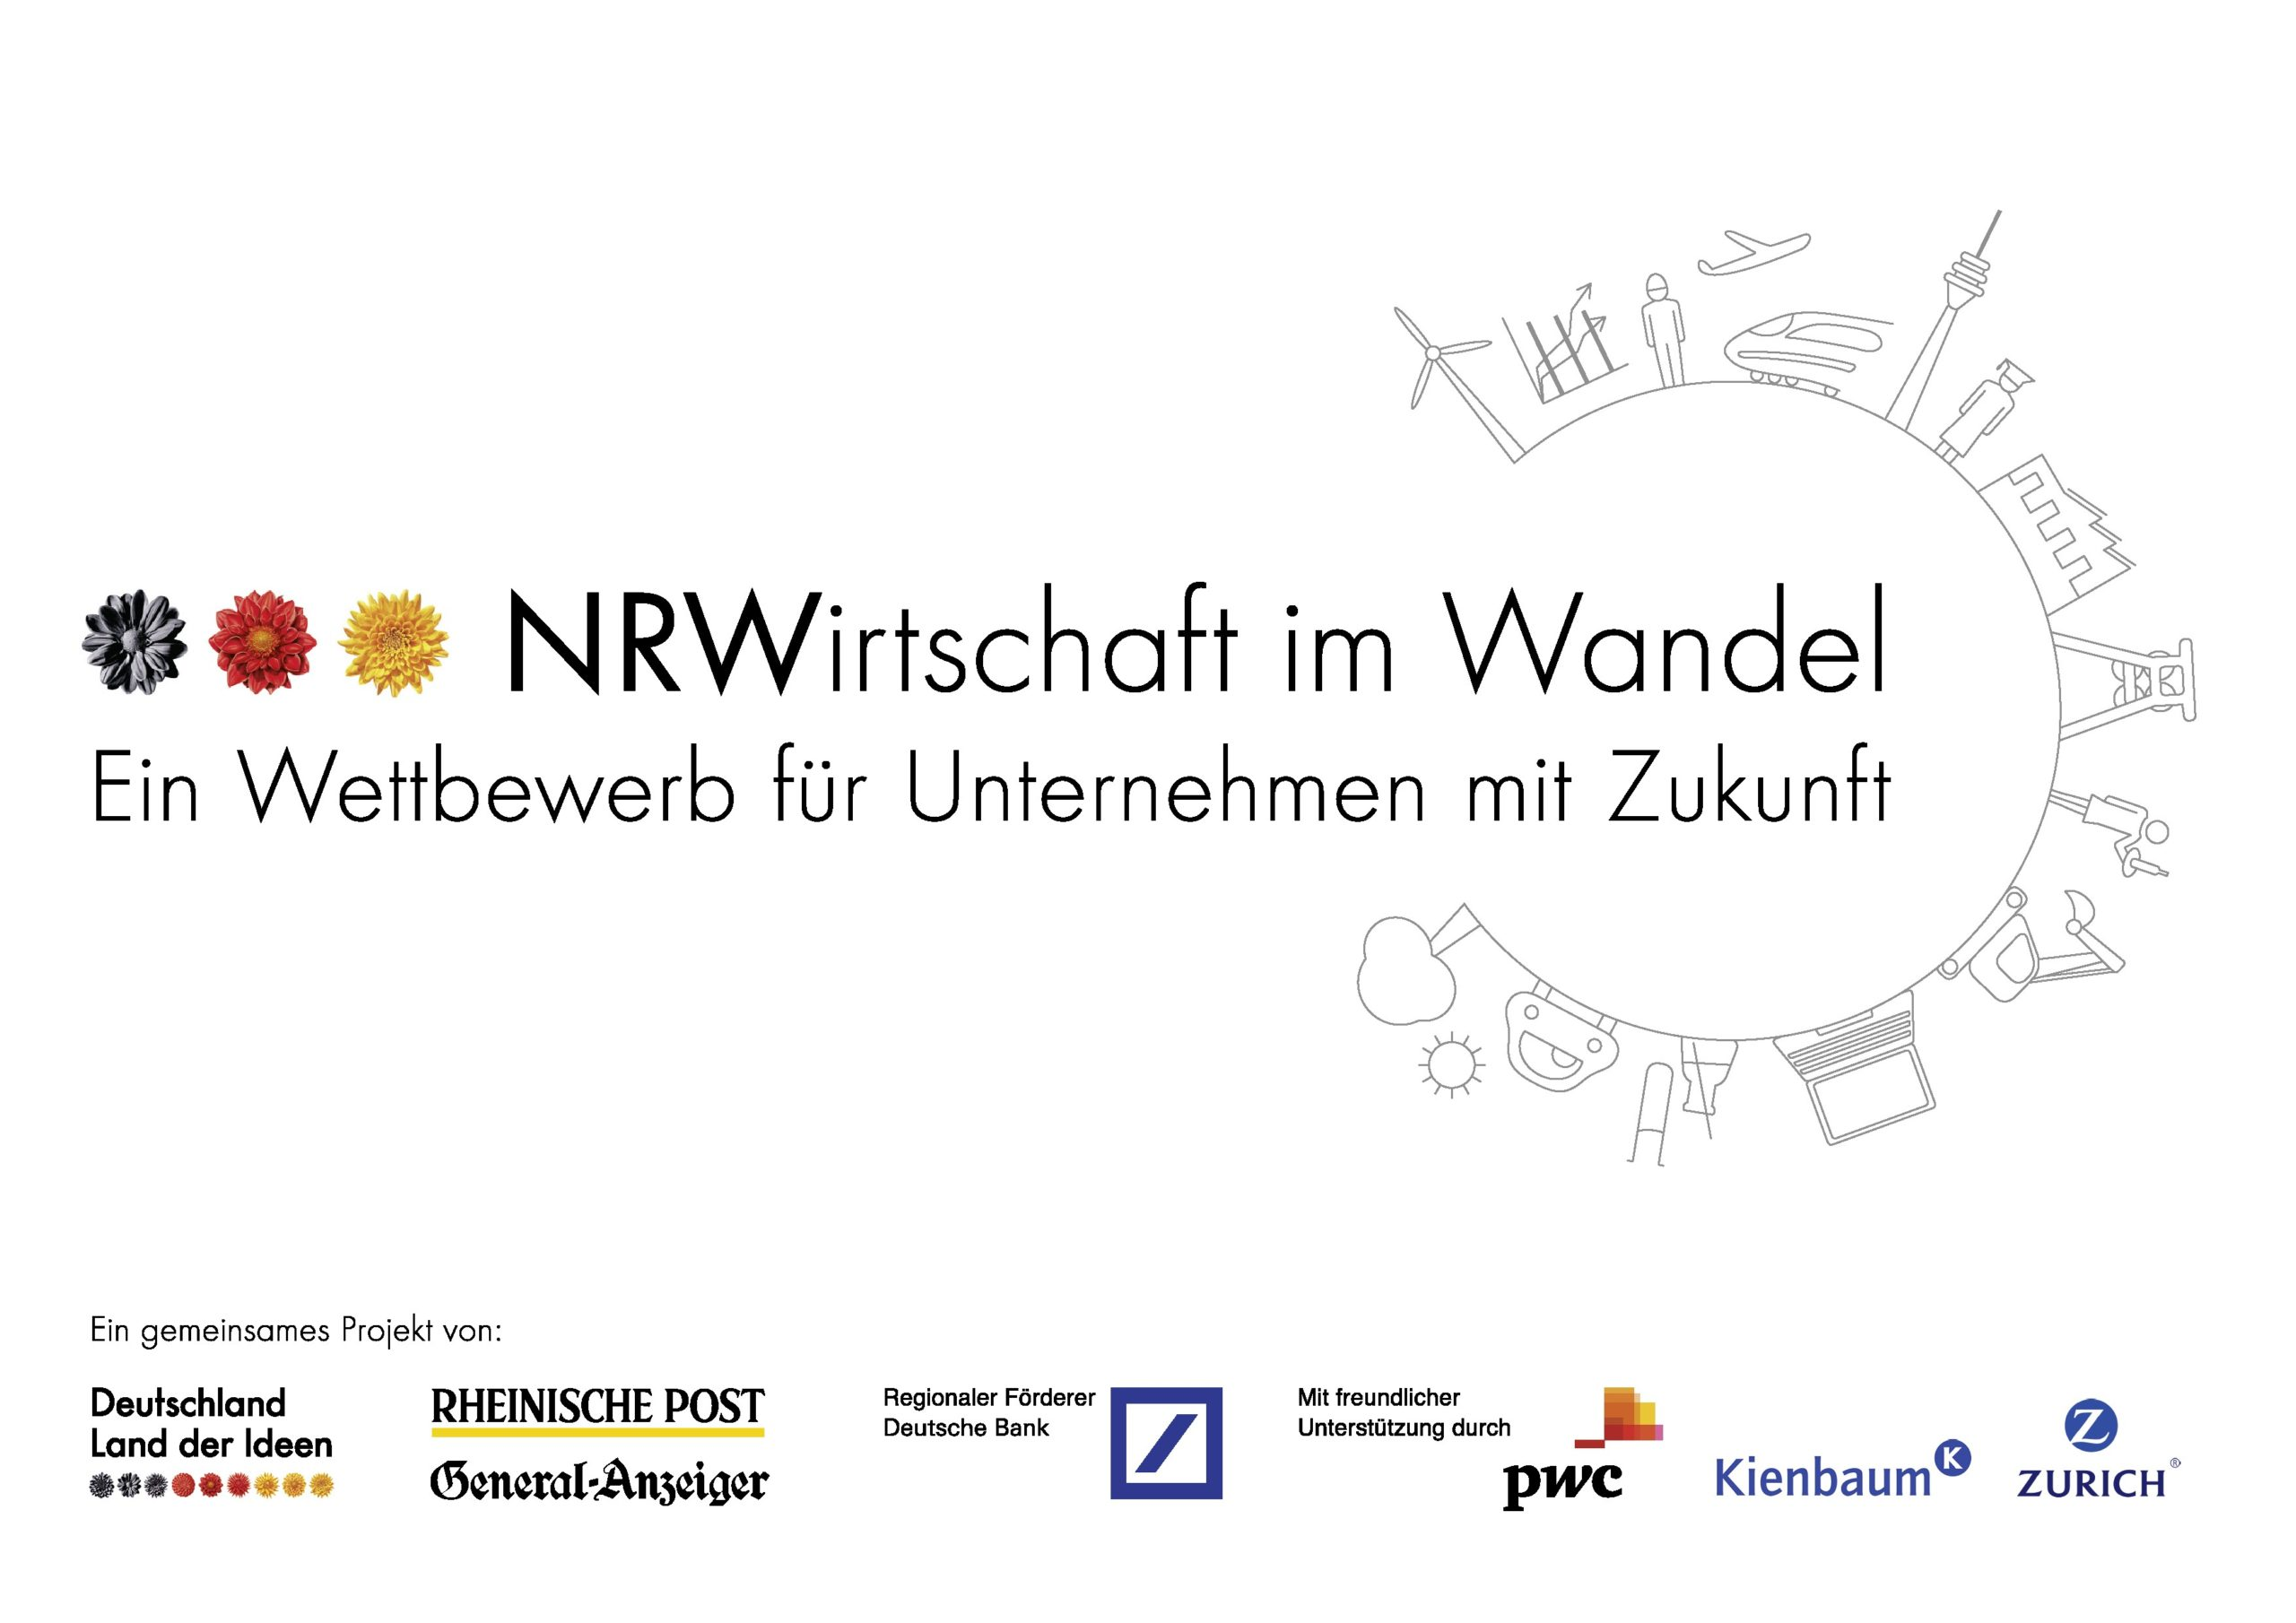 nrw-keyvisual-2020